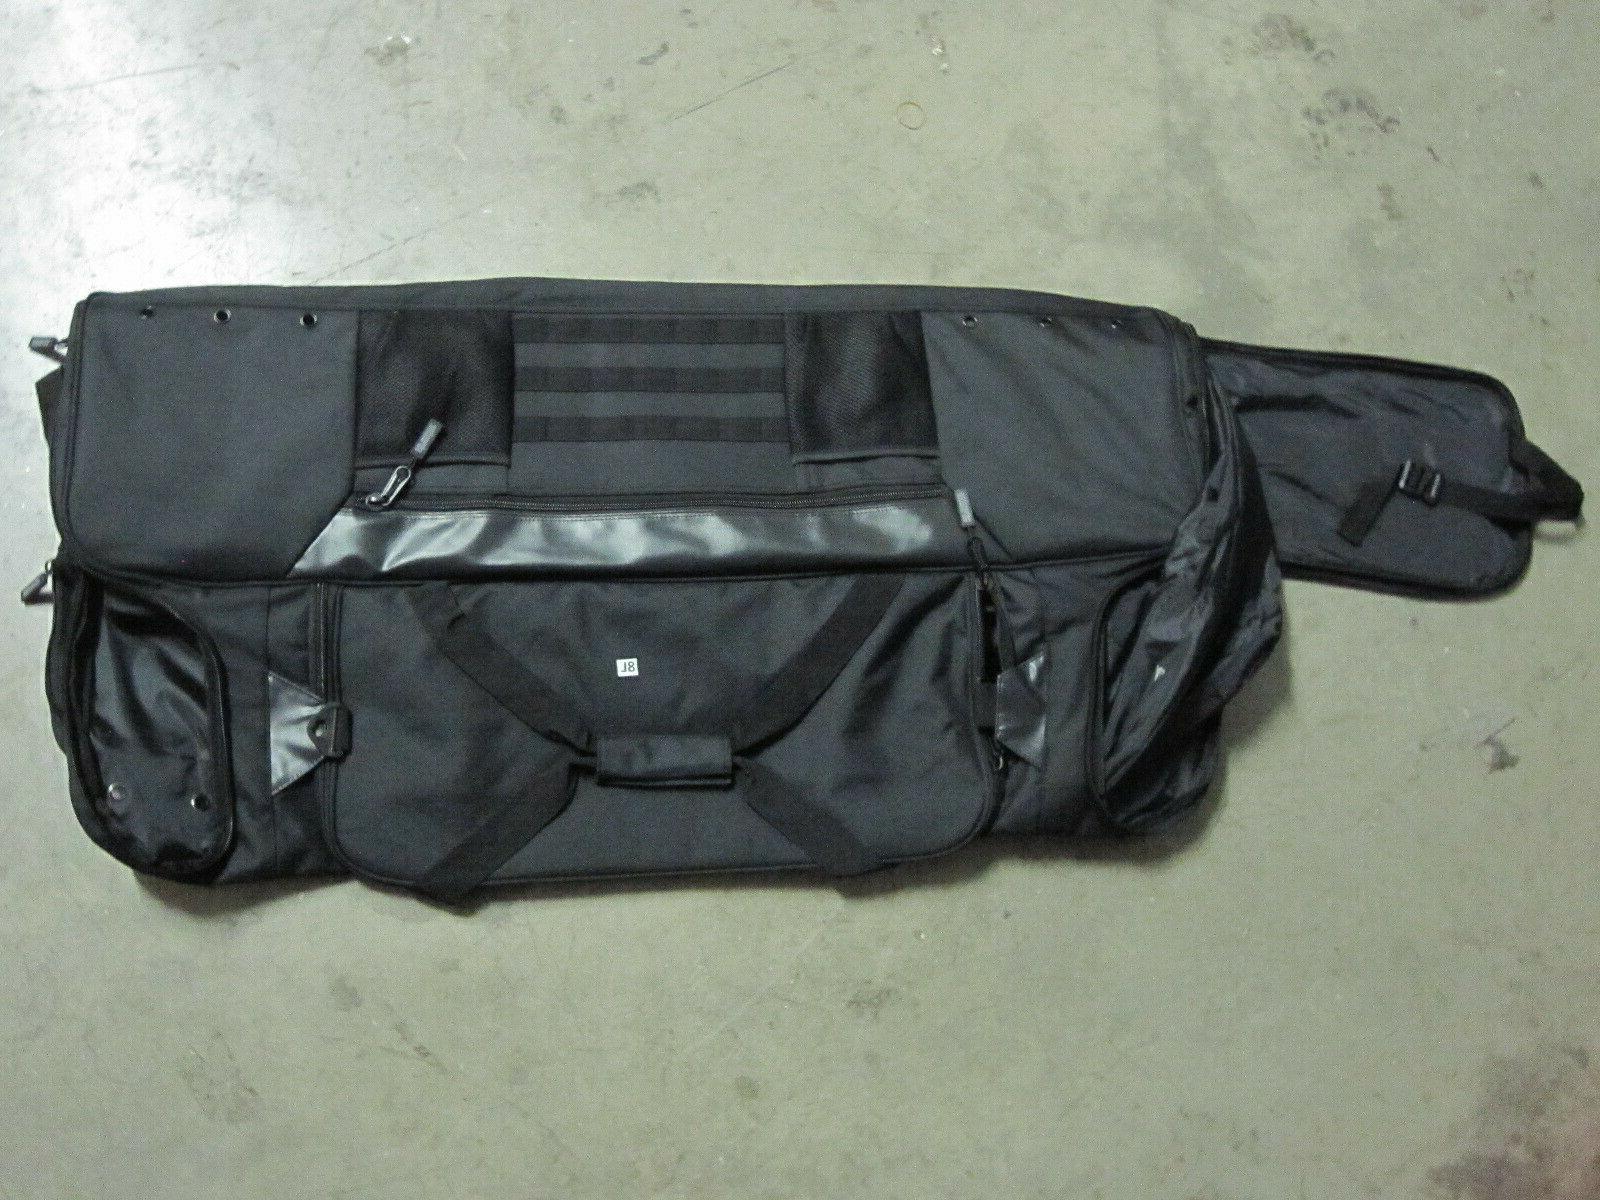 42 lacrosse equipment bag black